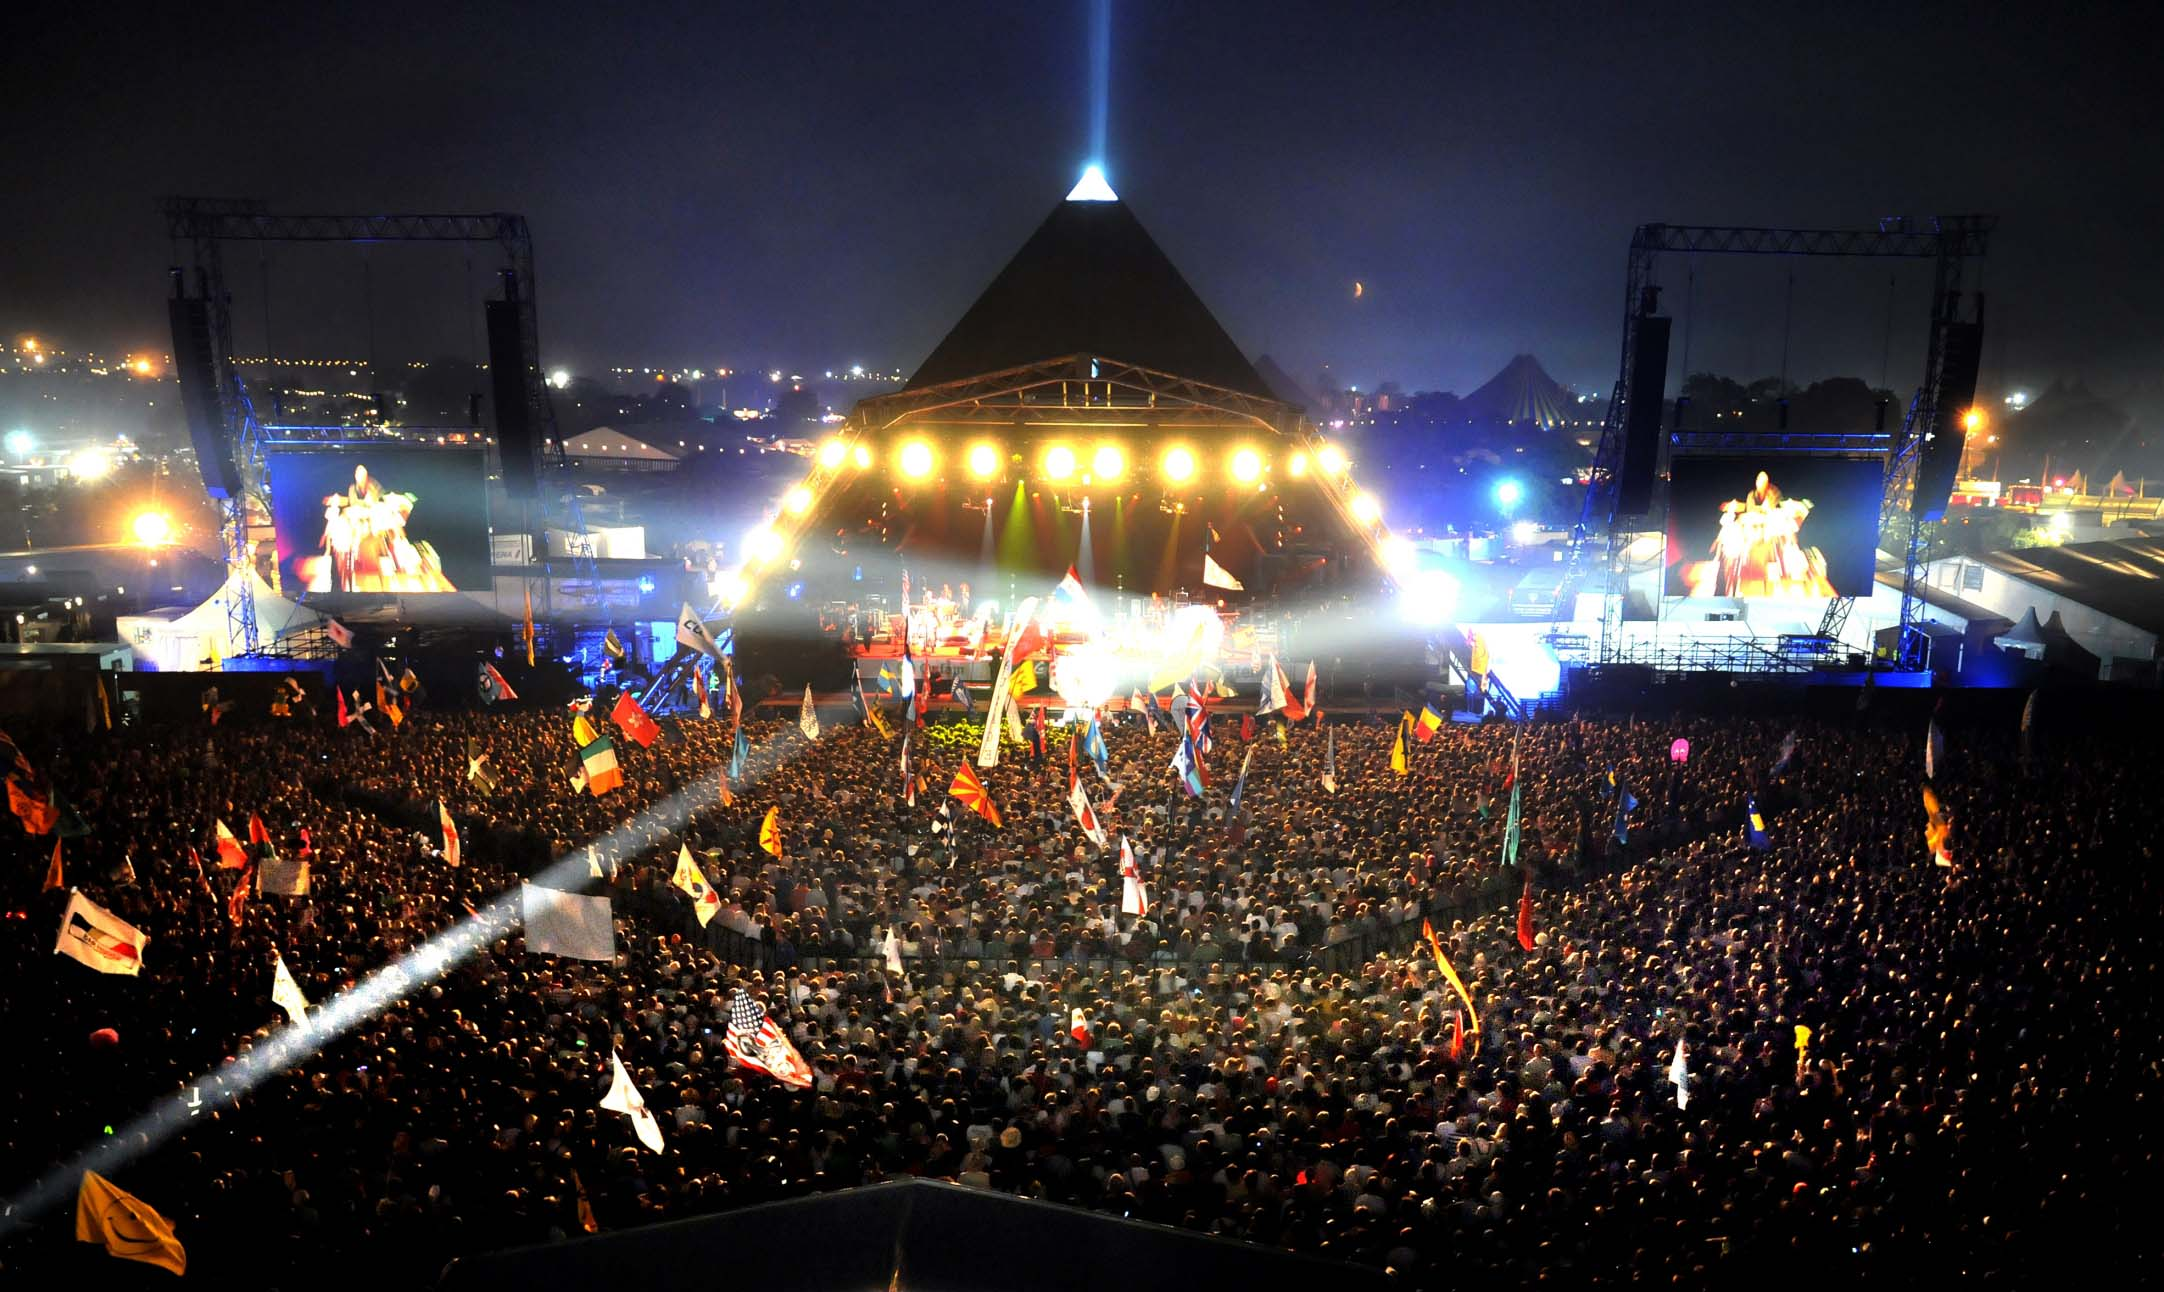 Glastonbury Music Festival, England